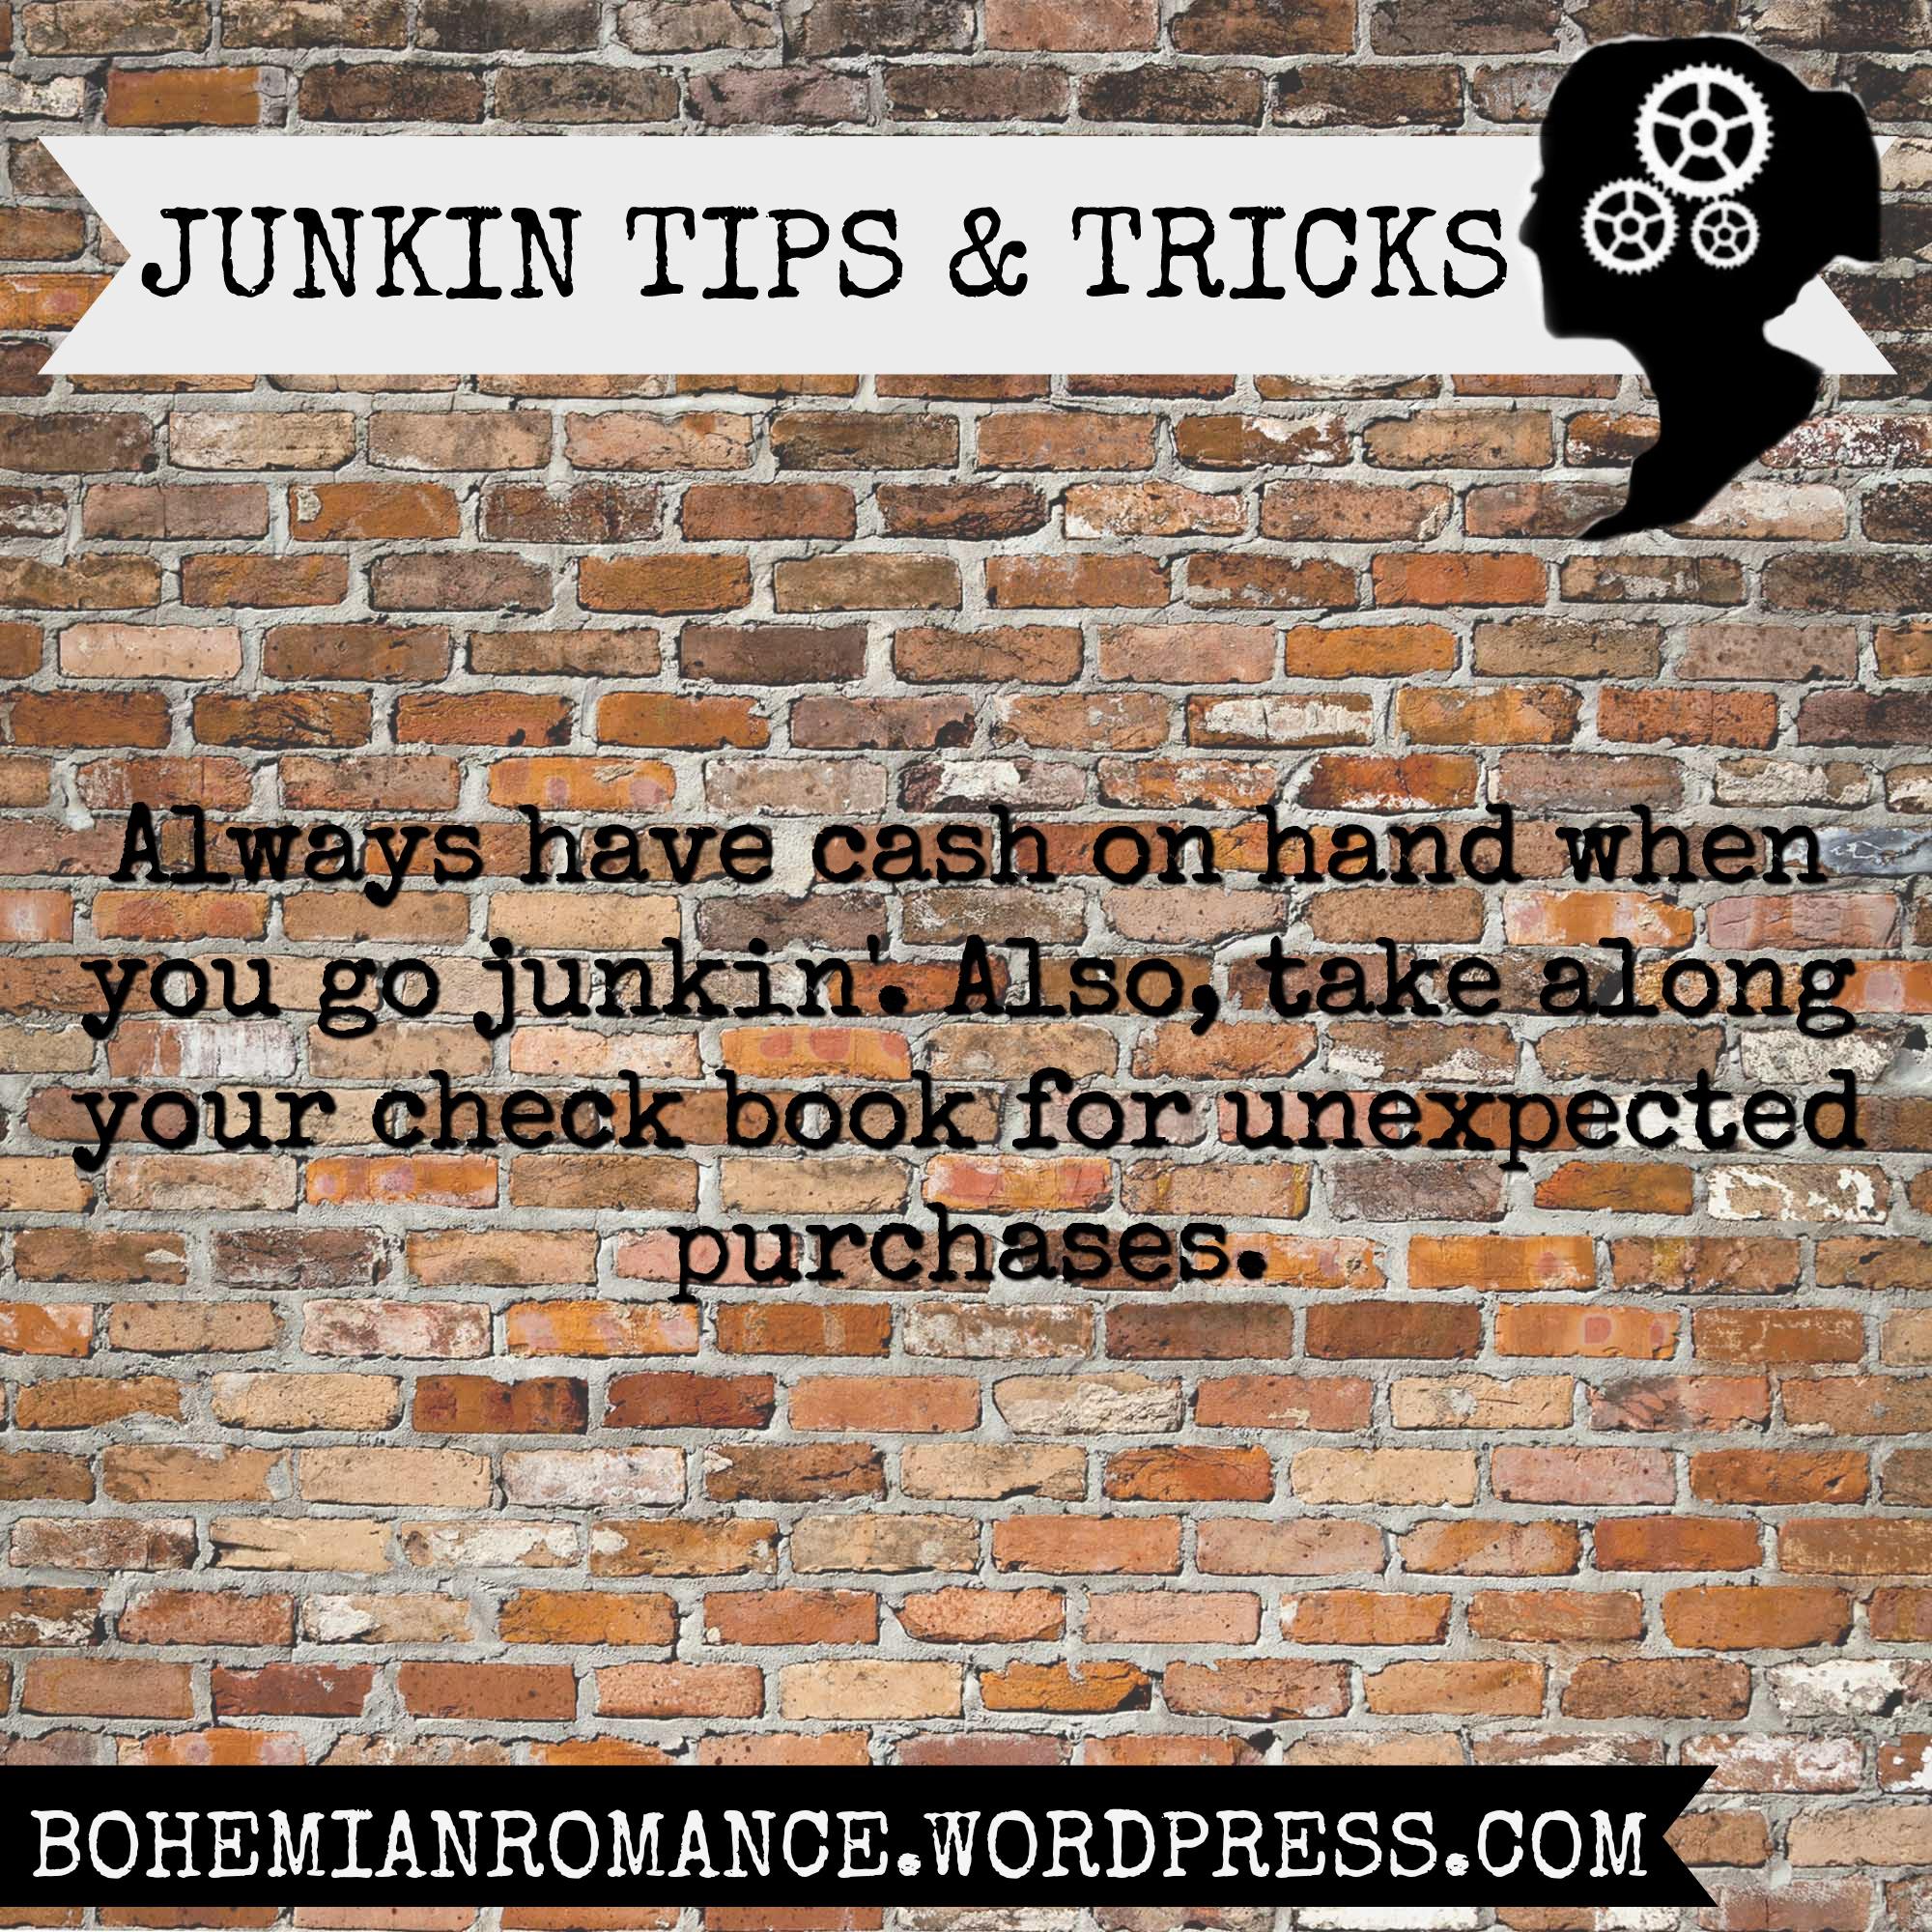 11-junkin-tips-tricks-template